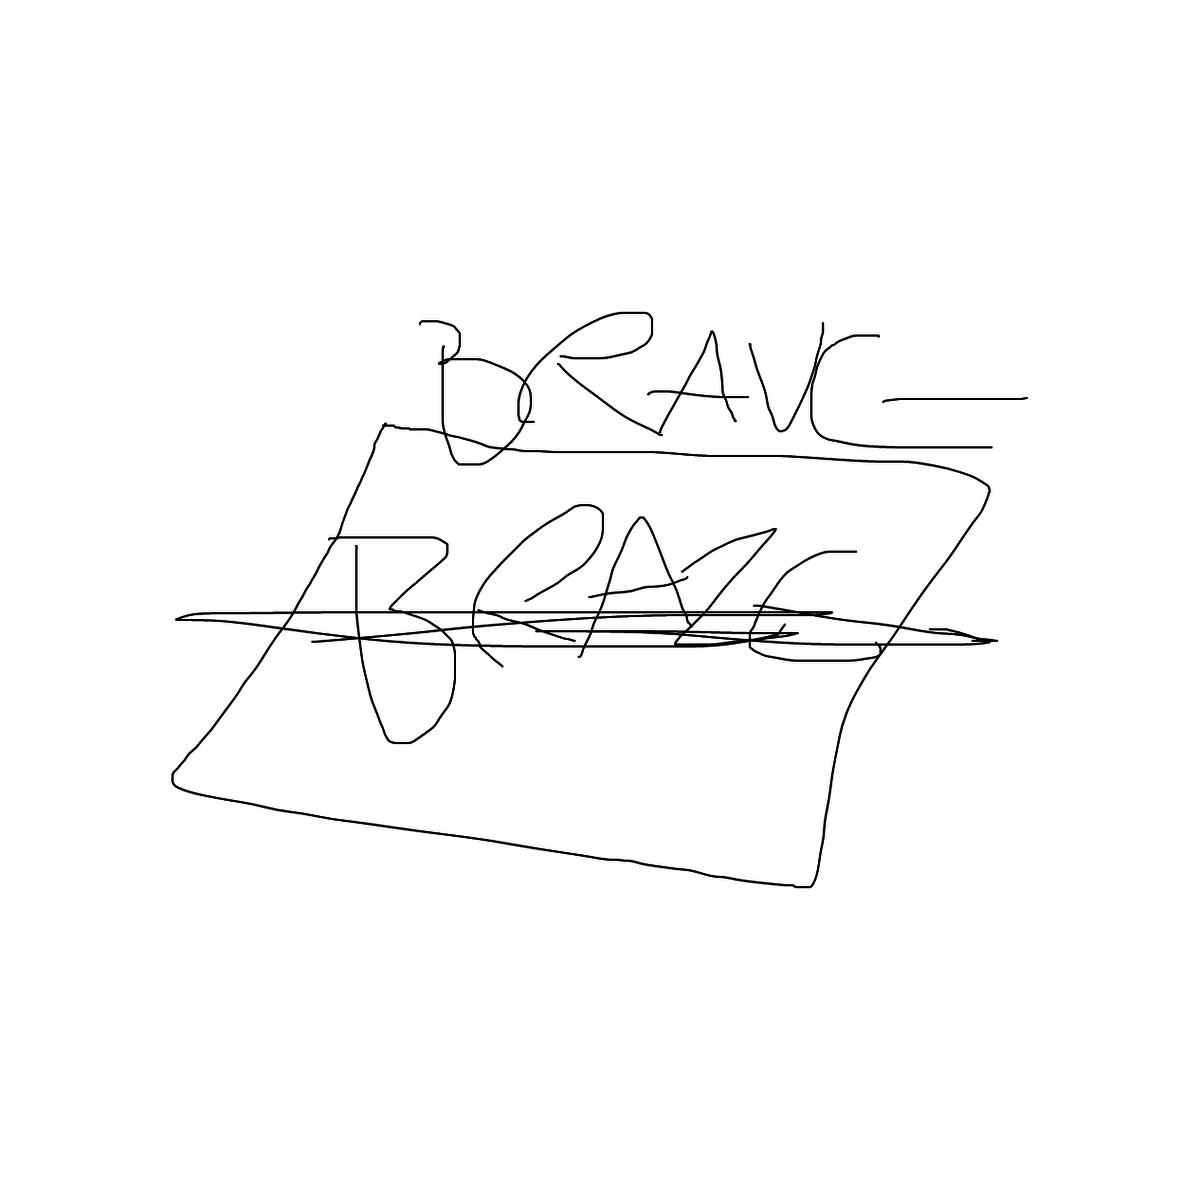 BAAAM drawing#6844 lat:19.0196990966796880lng: 72.8492355346679700